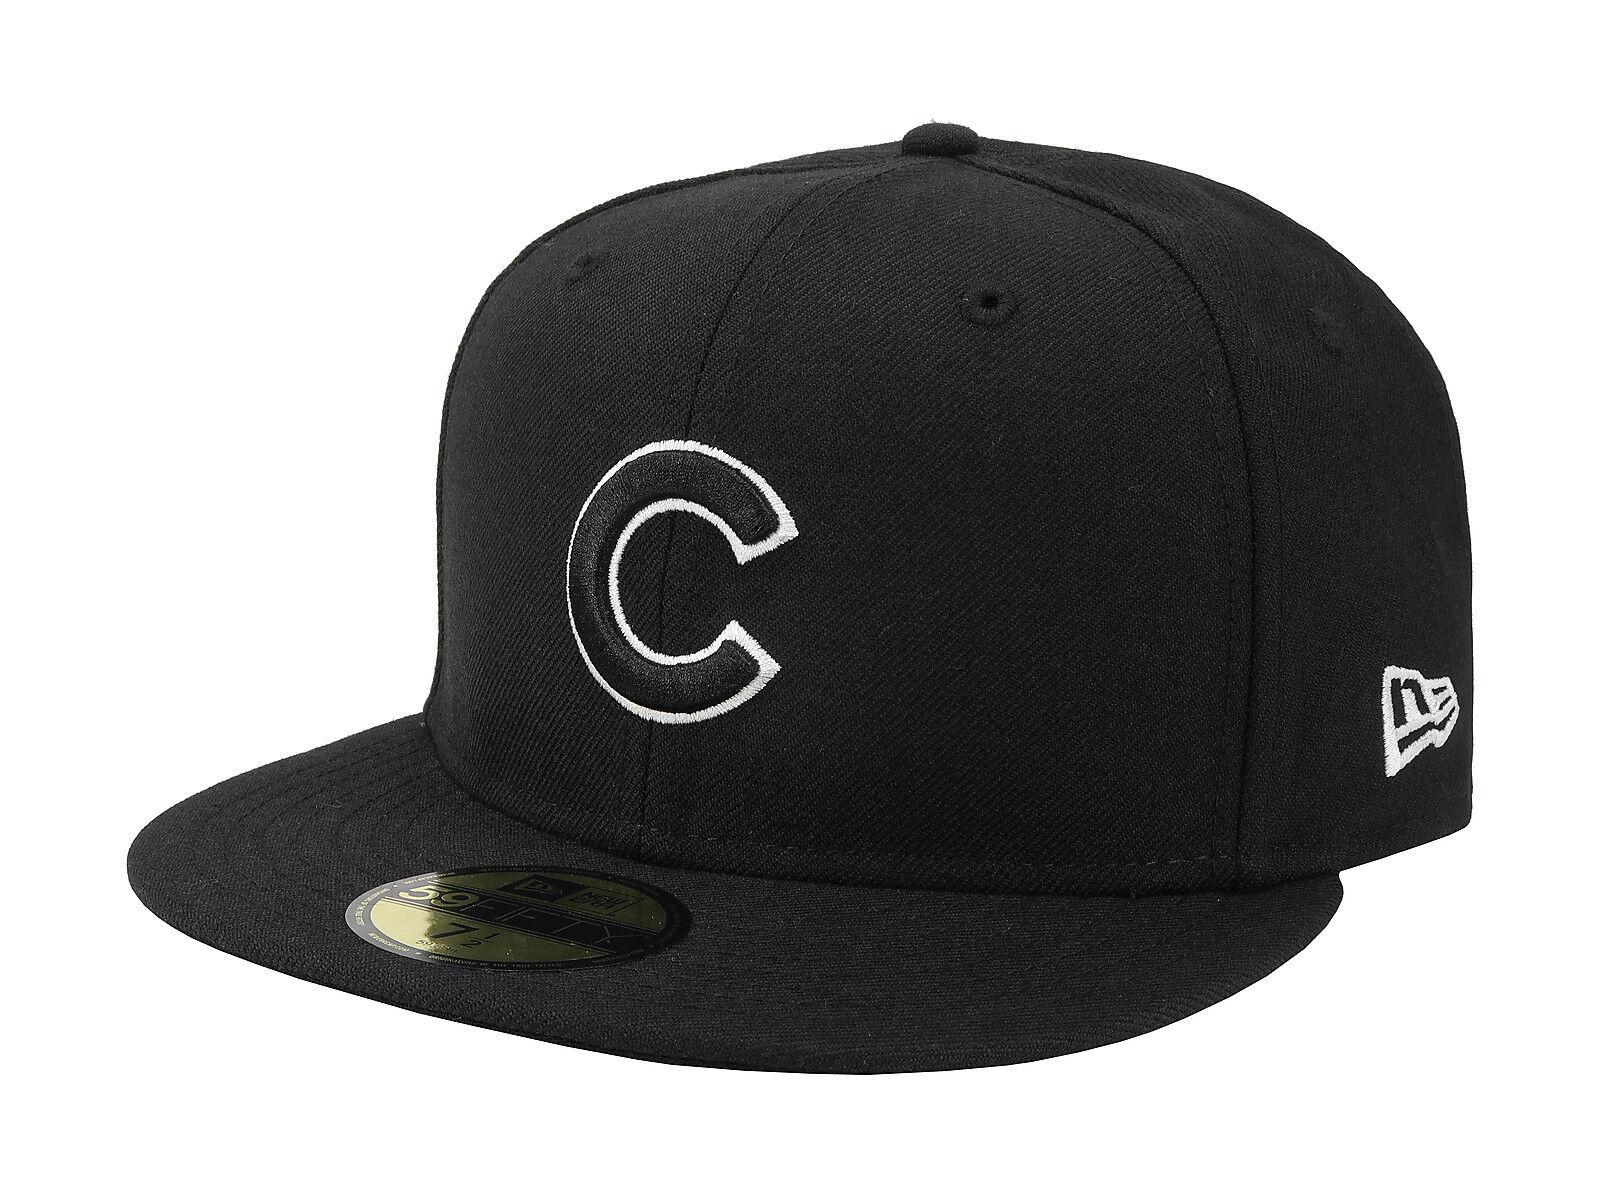 New Era 59Fifty Hat Mens MLB Chicago Cubs Apparel Mens Hat Womens Black White 5950 Cap 085f5f